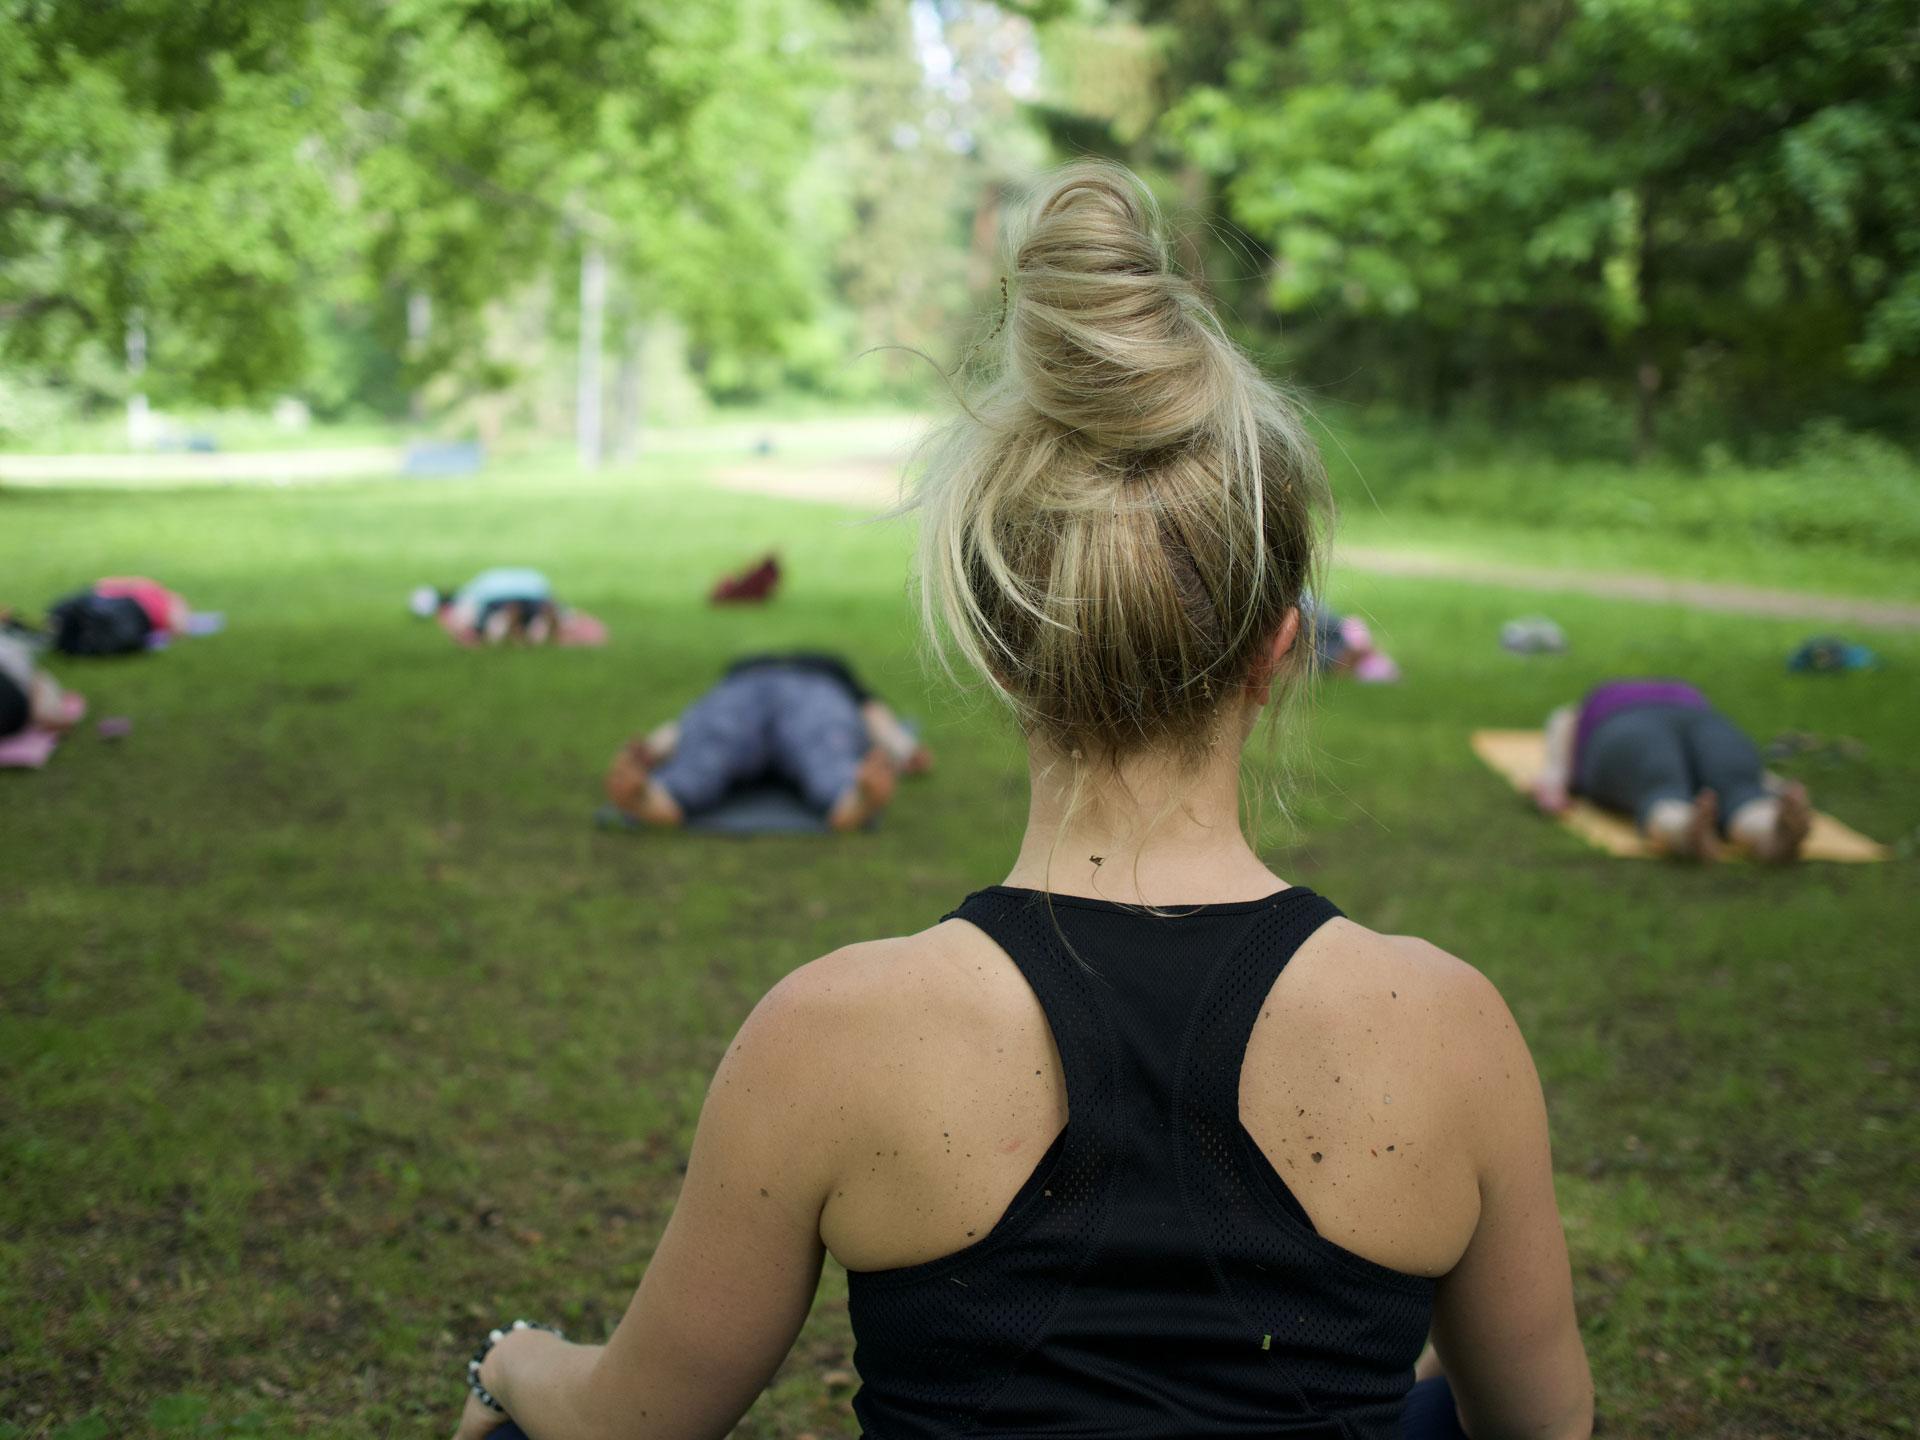 Link to event Yoga Morning in Seurasaari